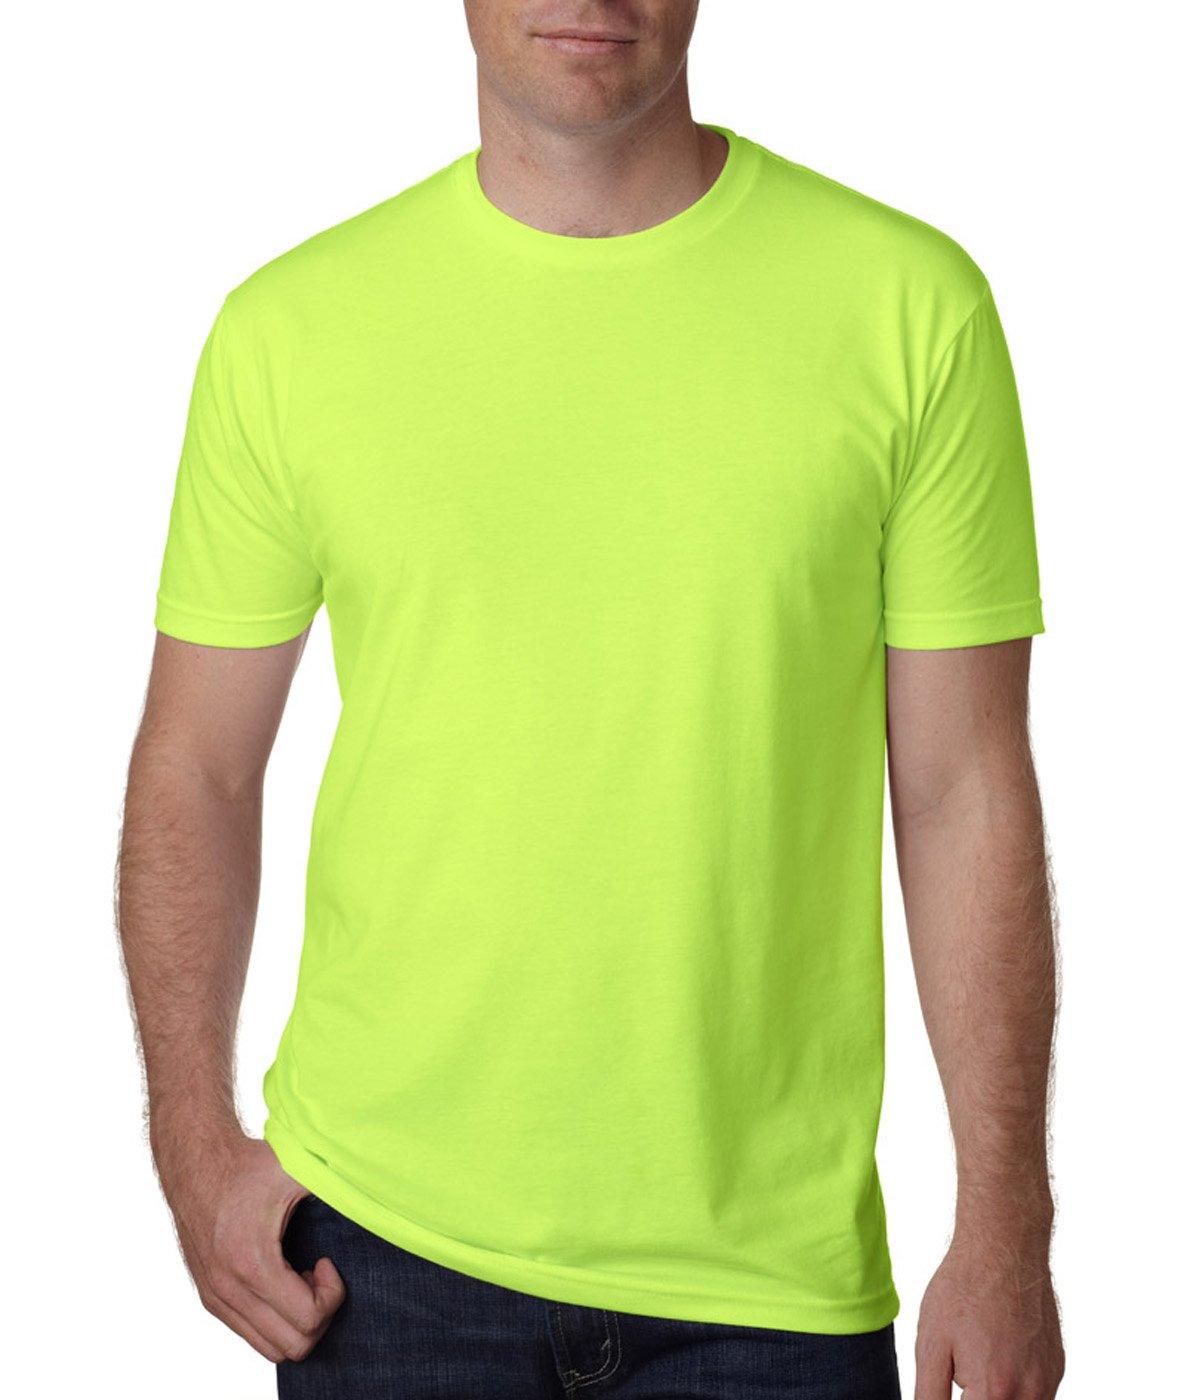 Next Level Apparel メンズ CVC クルーネック ジャージ Tシャツ B014WDENXA L|ネオンヘザーグリーン ネオンヘザーグリーン L